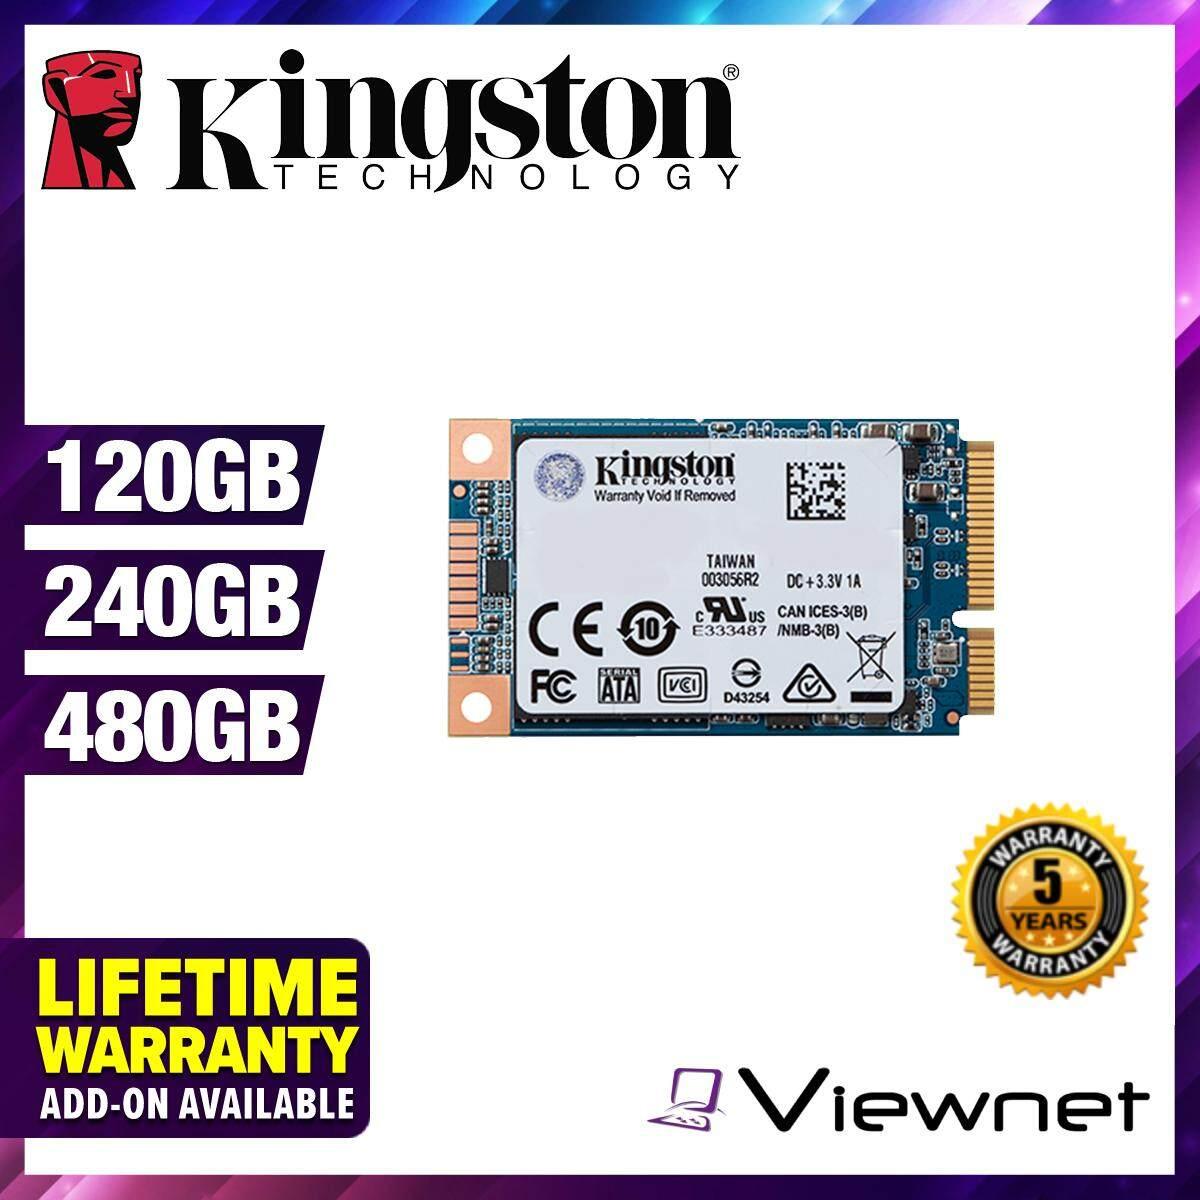 Kingston MSATA UV500 120GB/240GB/480GB SSD Solid State Drives (SUV500MS/120G/SUV500MS/240G/SUV500MS/480G)